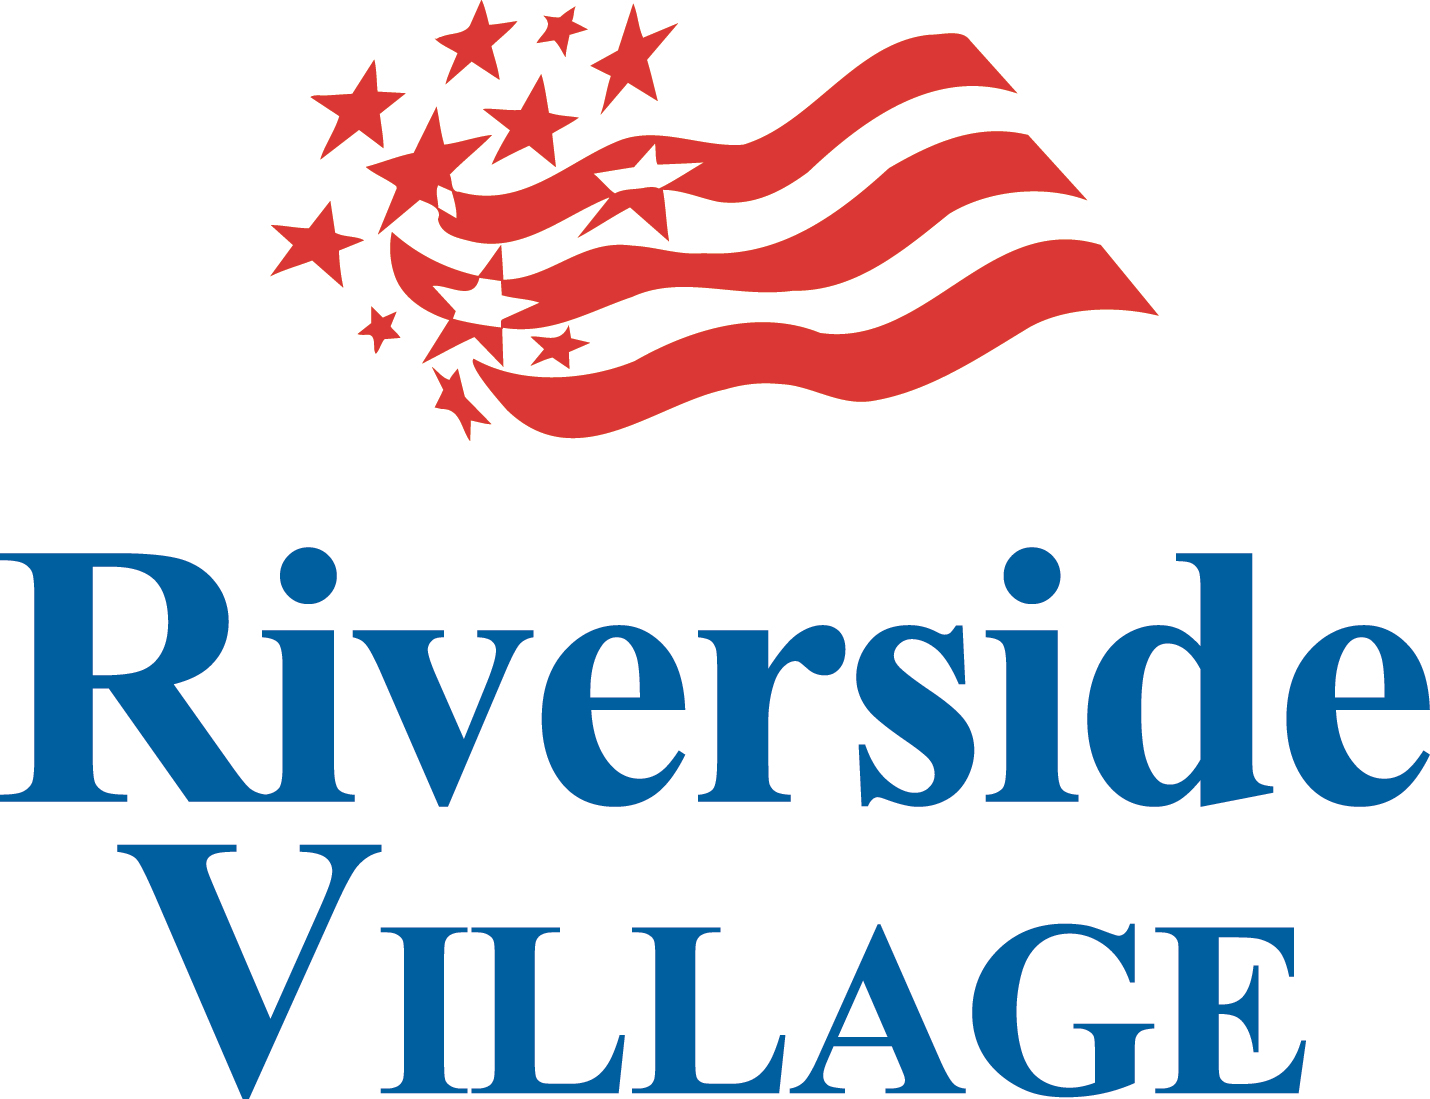 Riverside Village